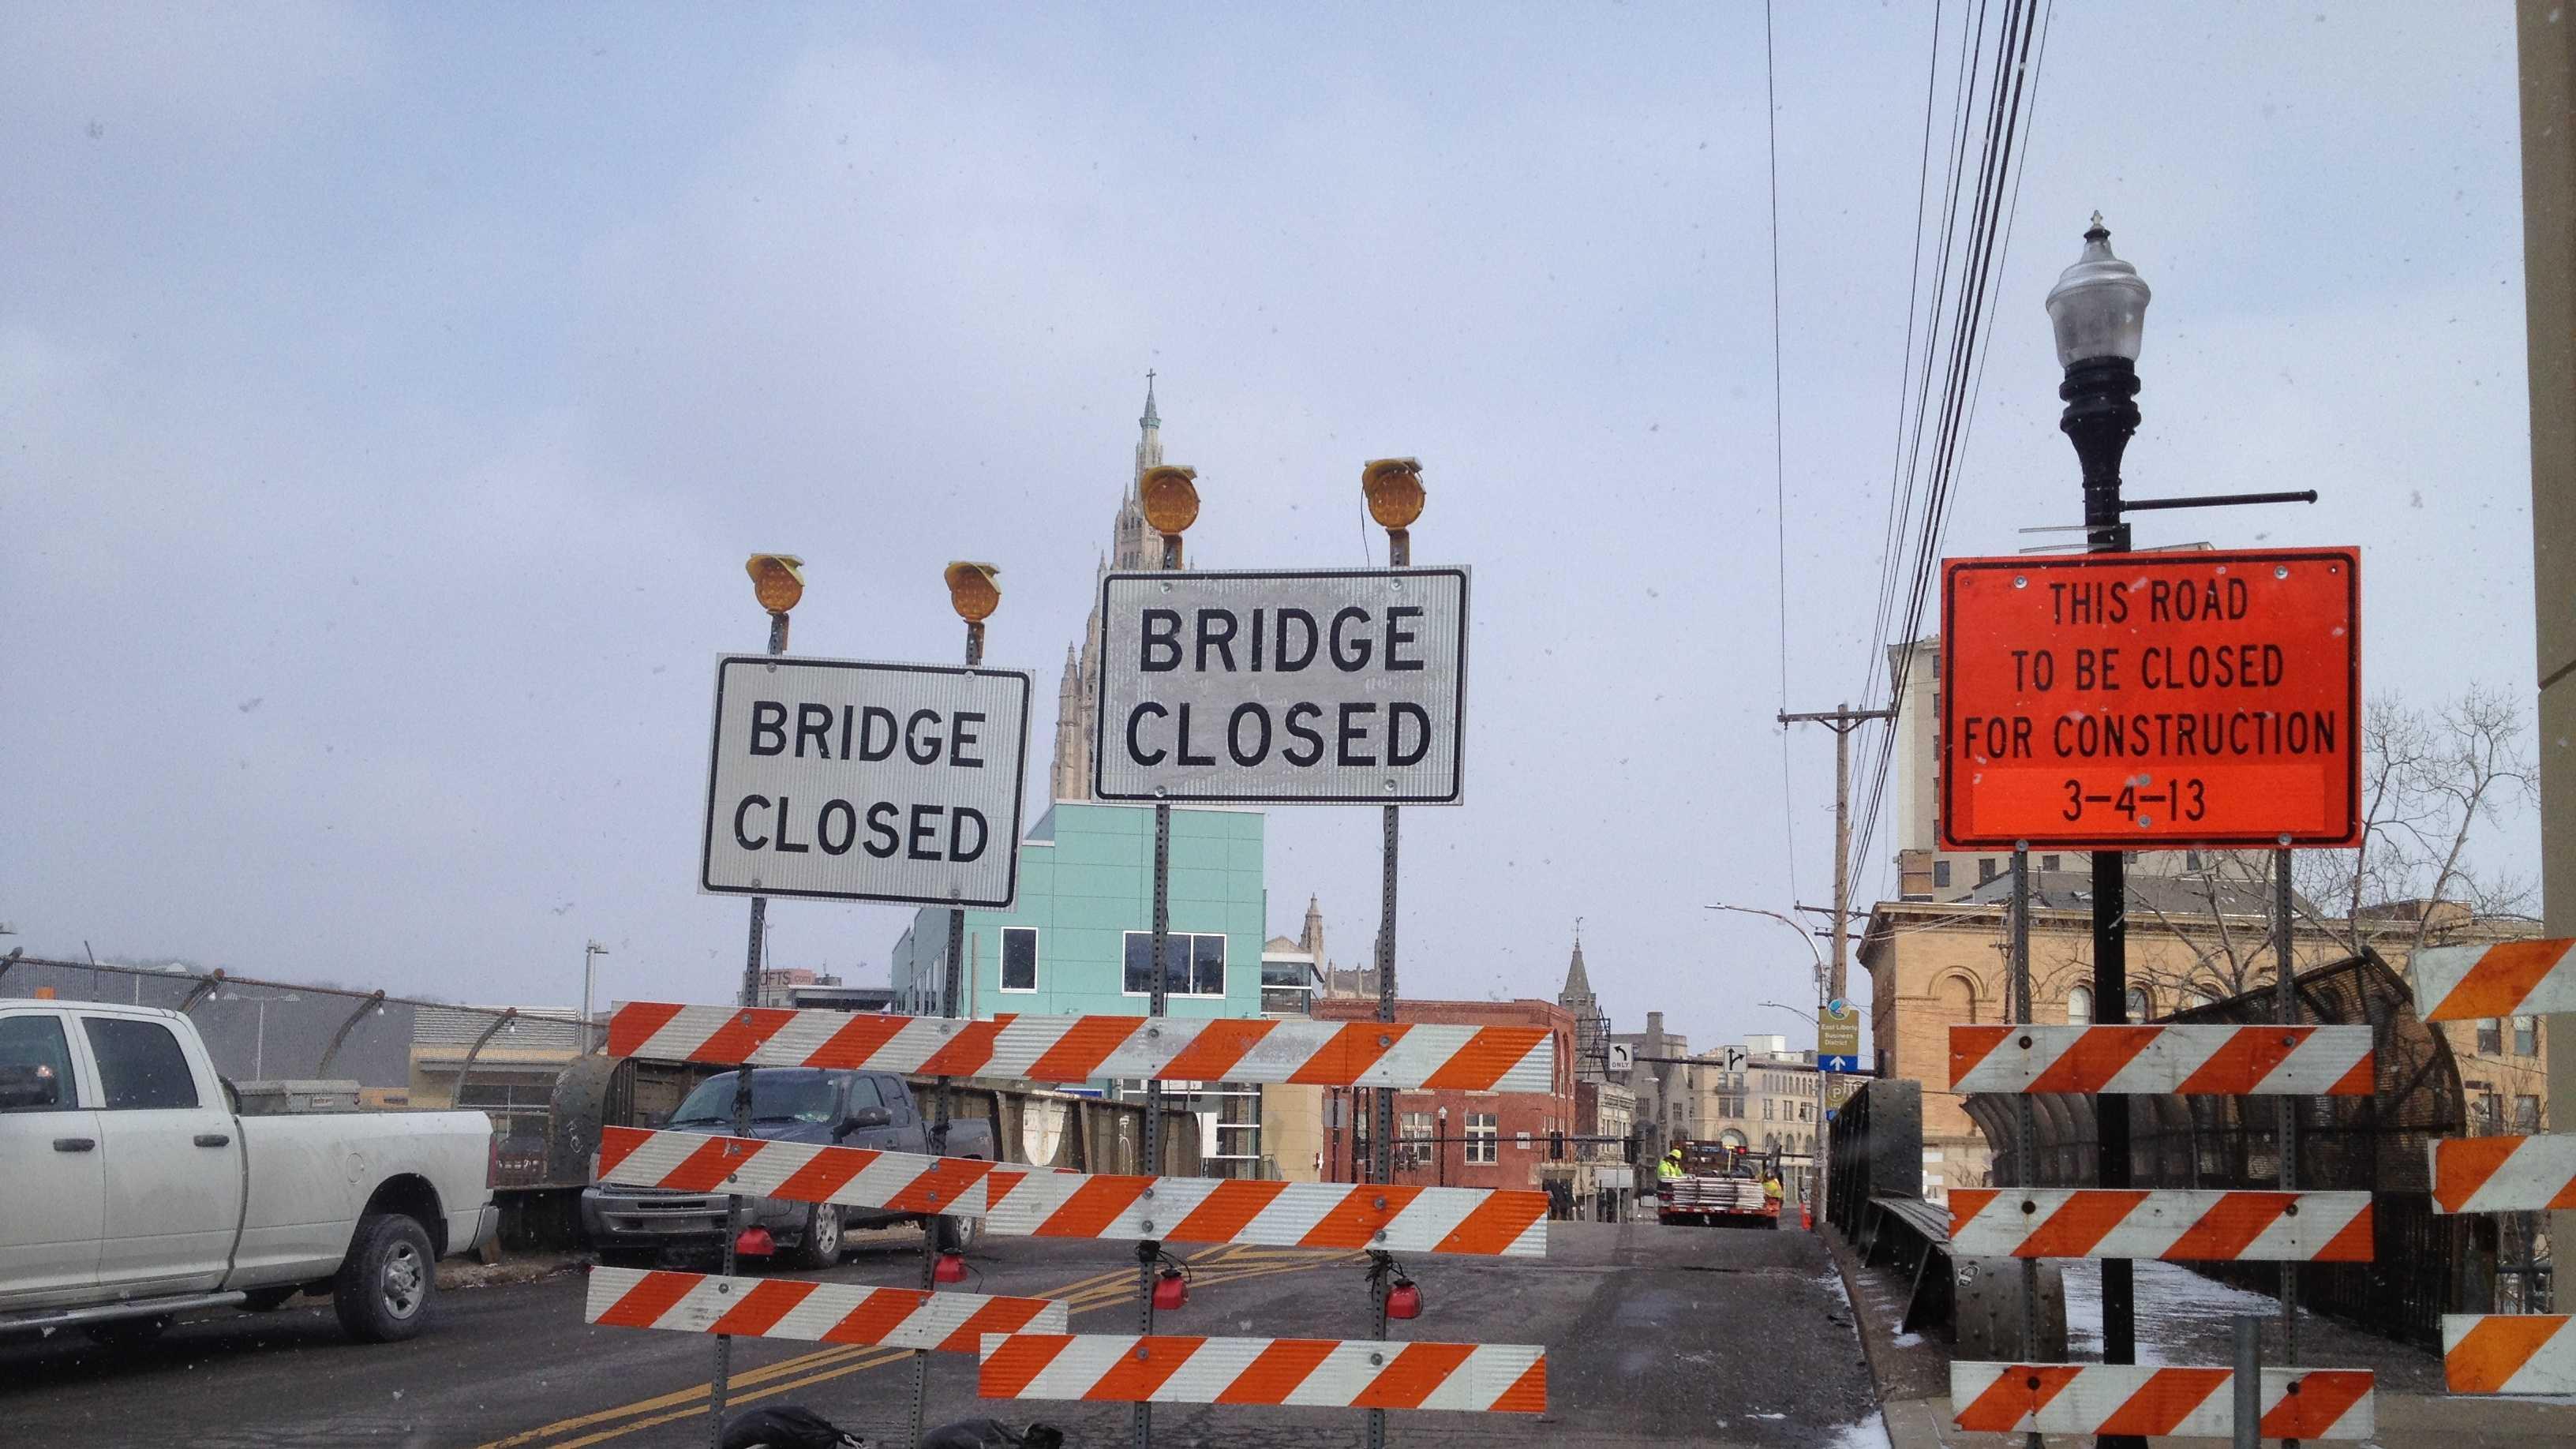 South Highland Avenue bridge